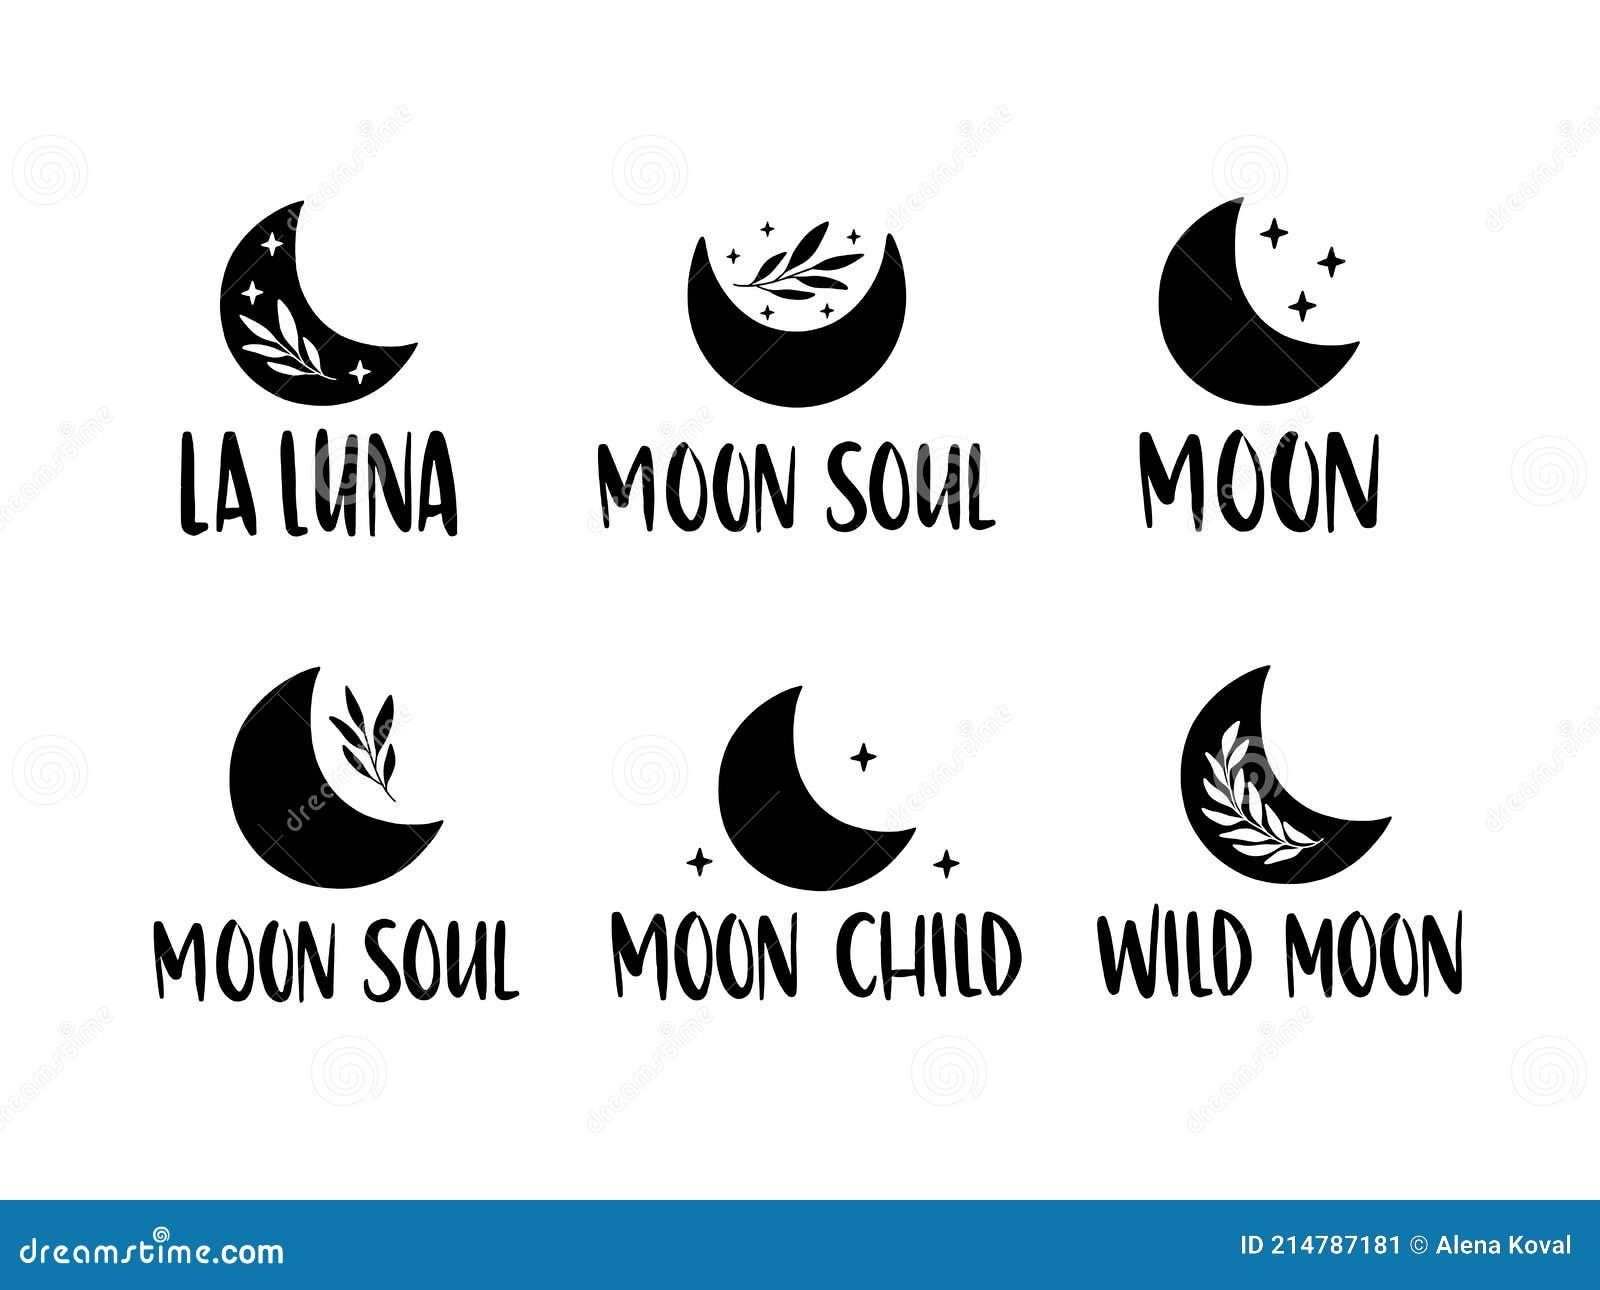 Boho Print Sun and Moon Print Mystic Print Astrology Print Printable Wall Art Celestial Print Digital Print